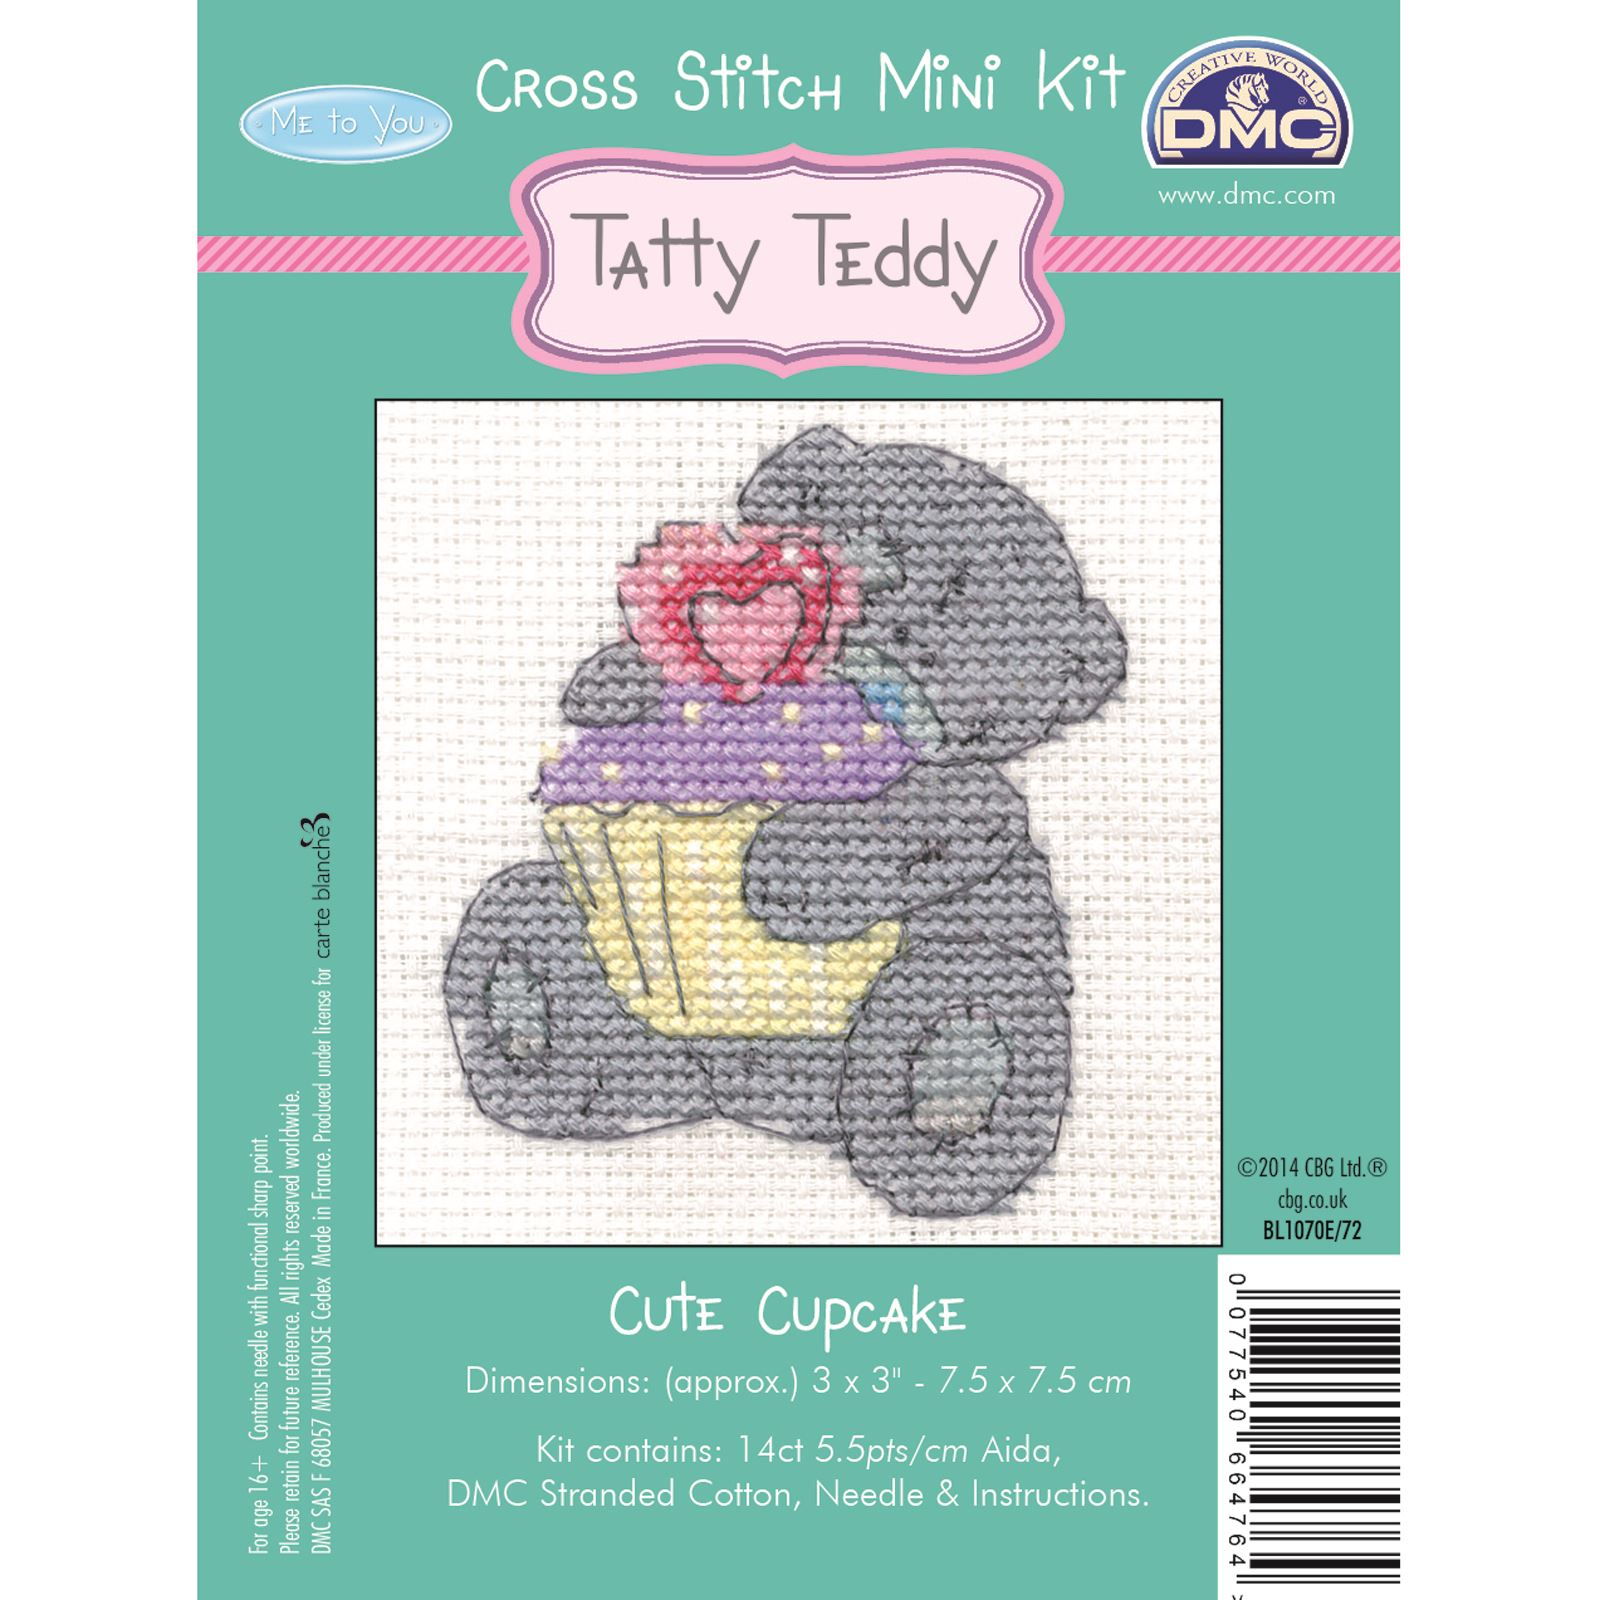 DMC-Mini-Cross-Stitch-Kit-Me-to-You-Tatty-Teddy-8-Designs thumbnail 5